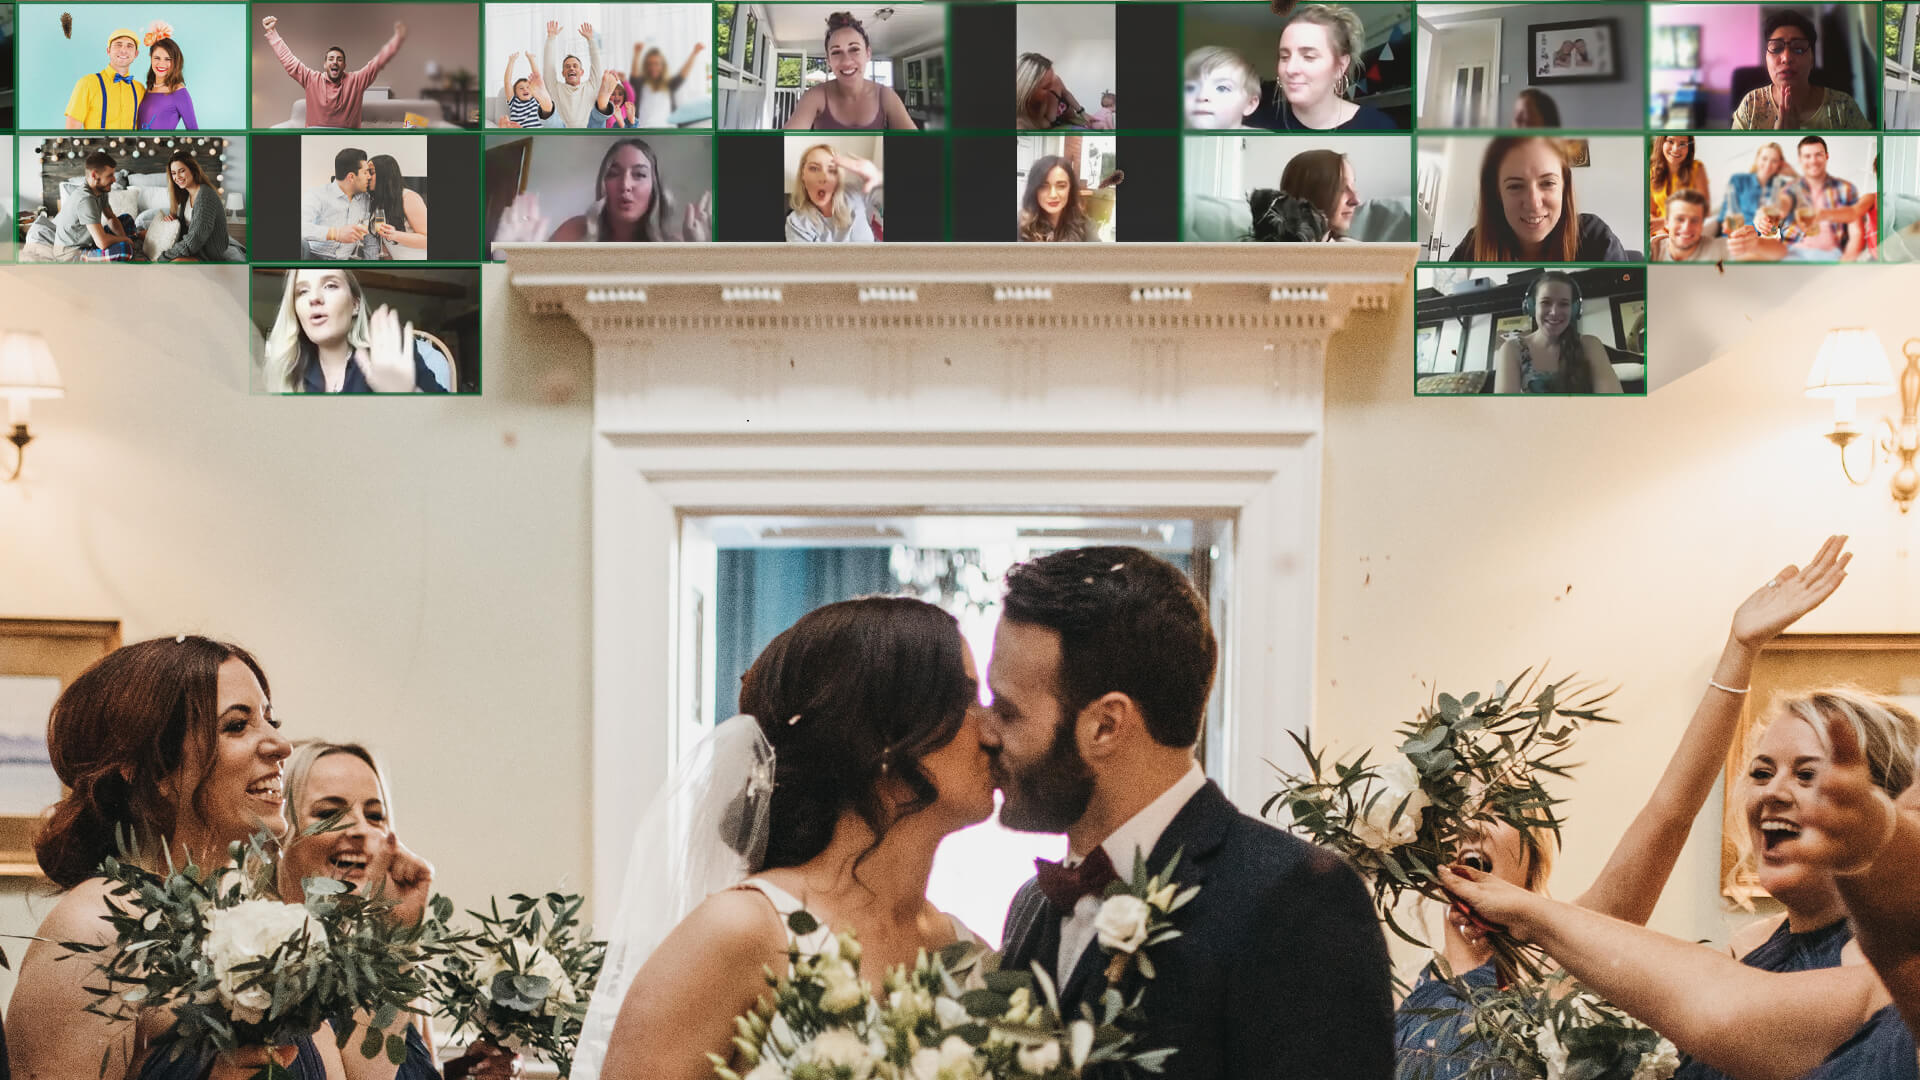 wedding live stream virtual wall by prescription media